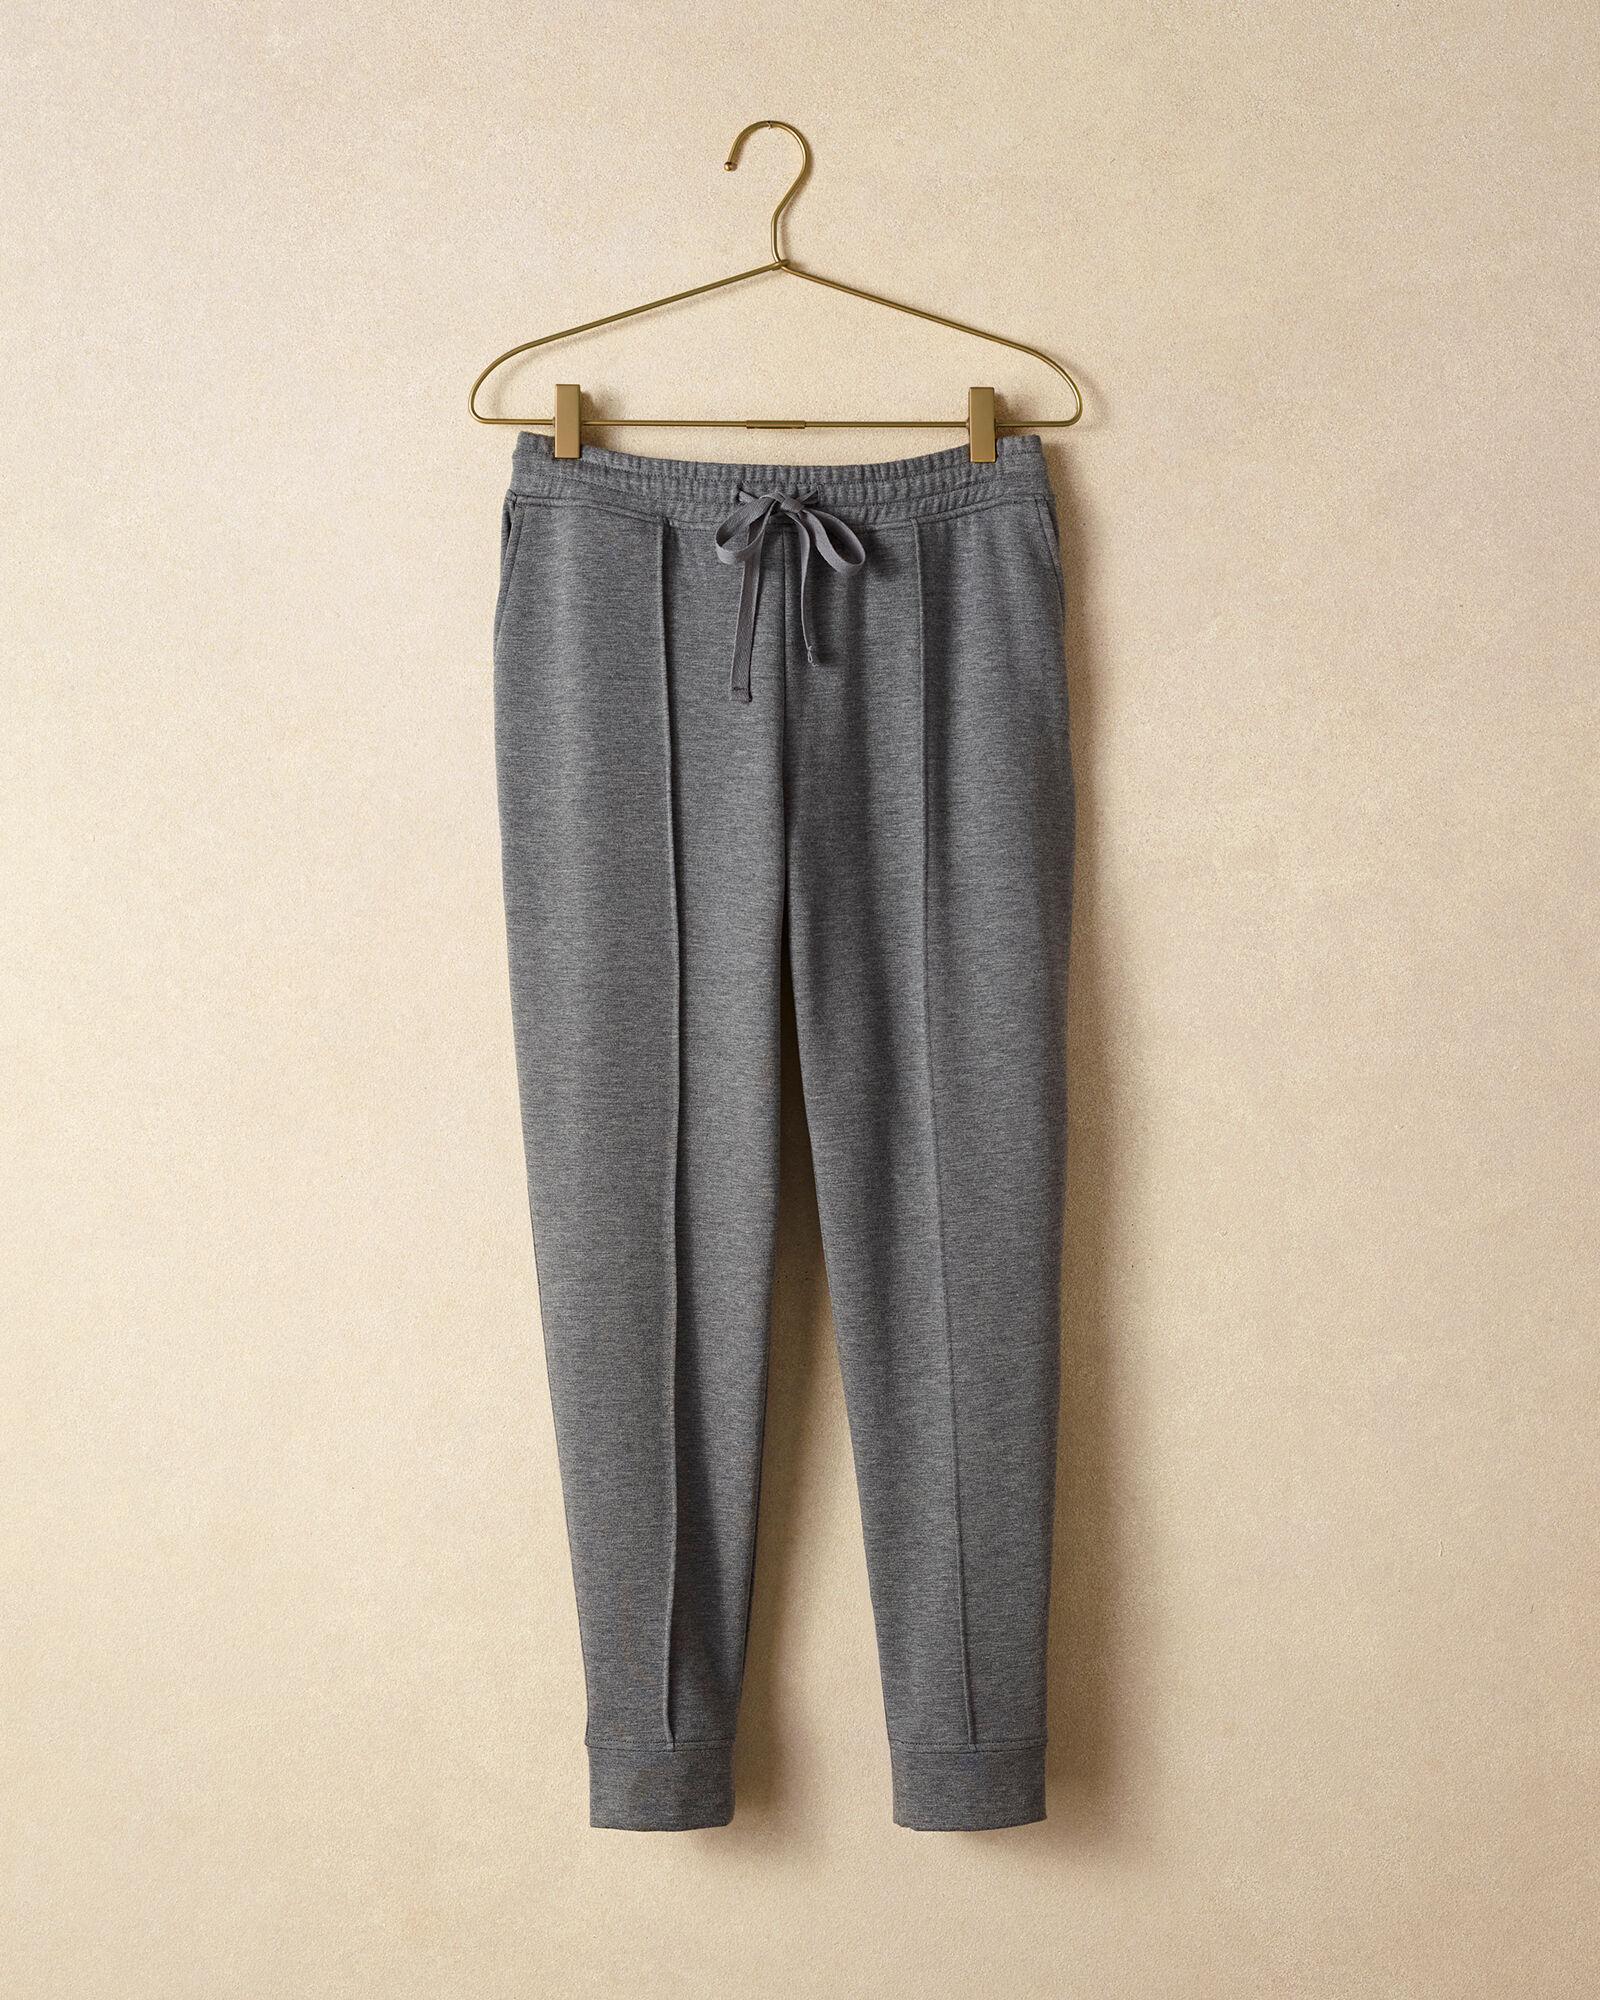 Talbots Cloud Fleece Jogger - Graphite Grey Heather - XS Talbots  - Graphite Grey Heather - Size: female - Size: Extra Small